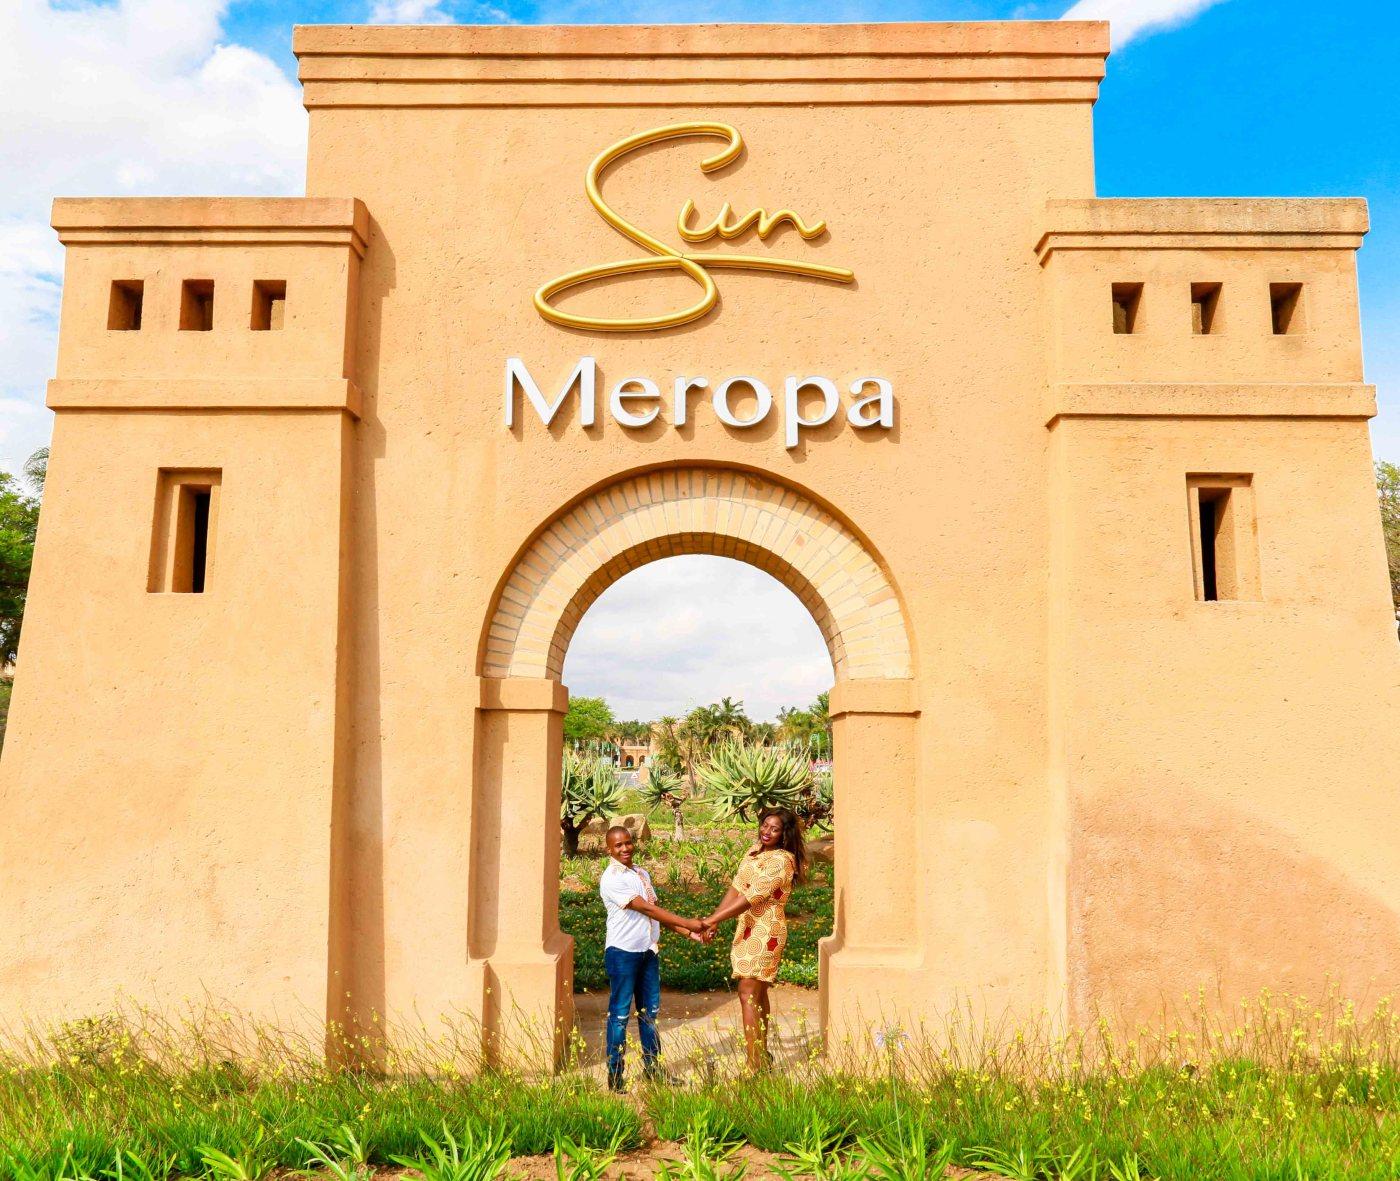 Mercy and Shibe Meropa Pre-Wedding Engagement Photographer Booking Polokwane Wedding Photographer14